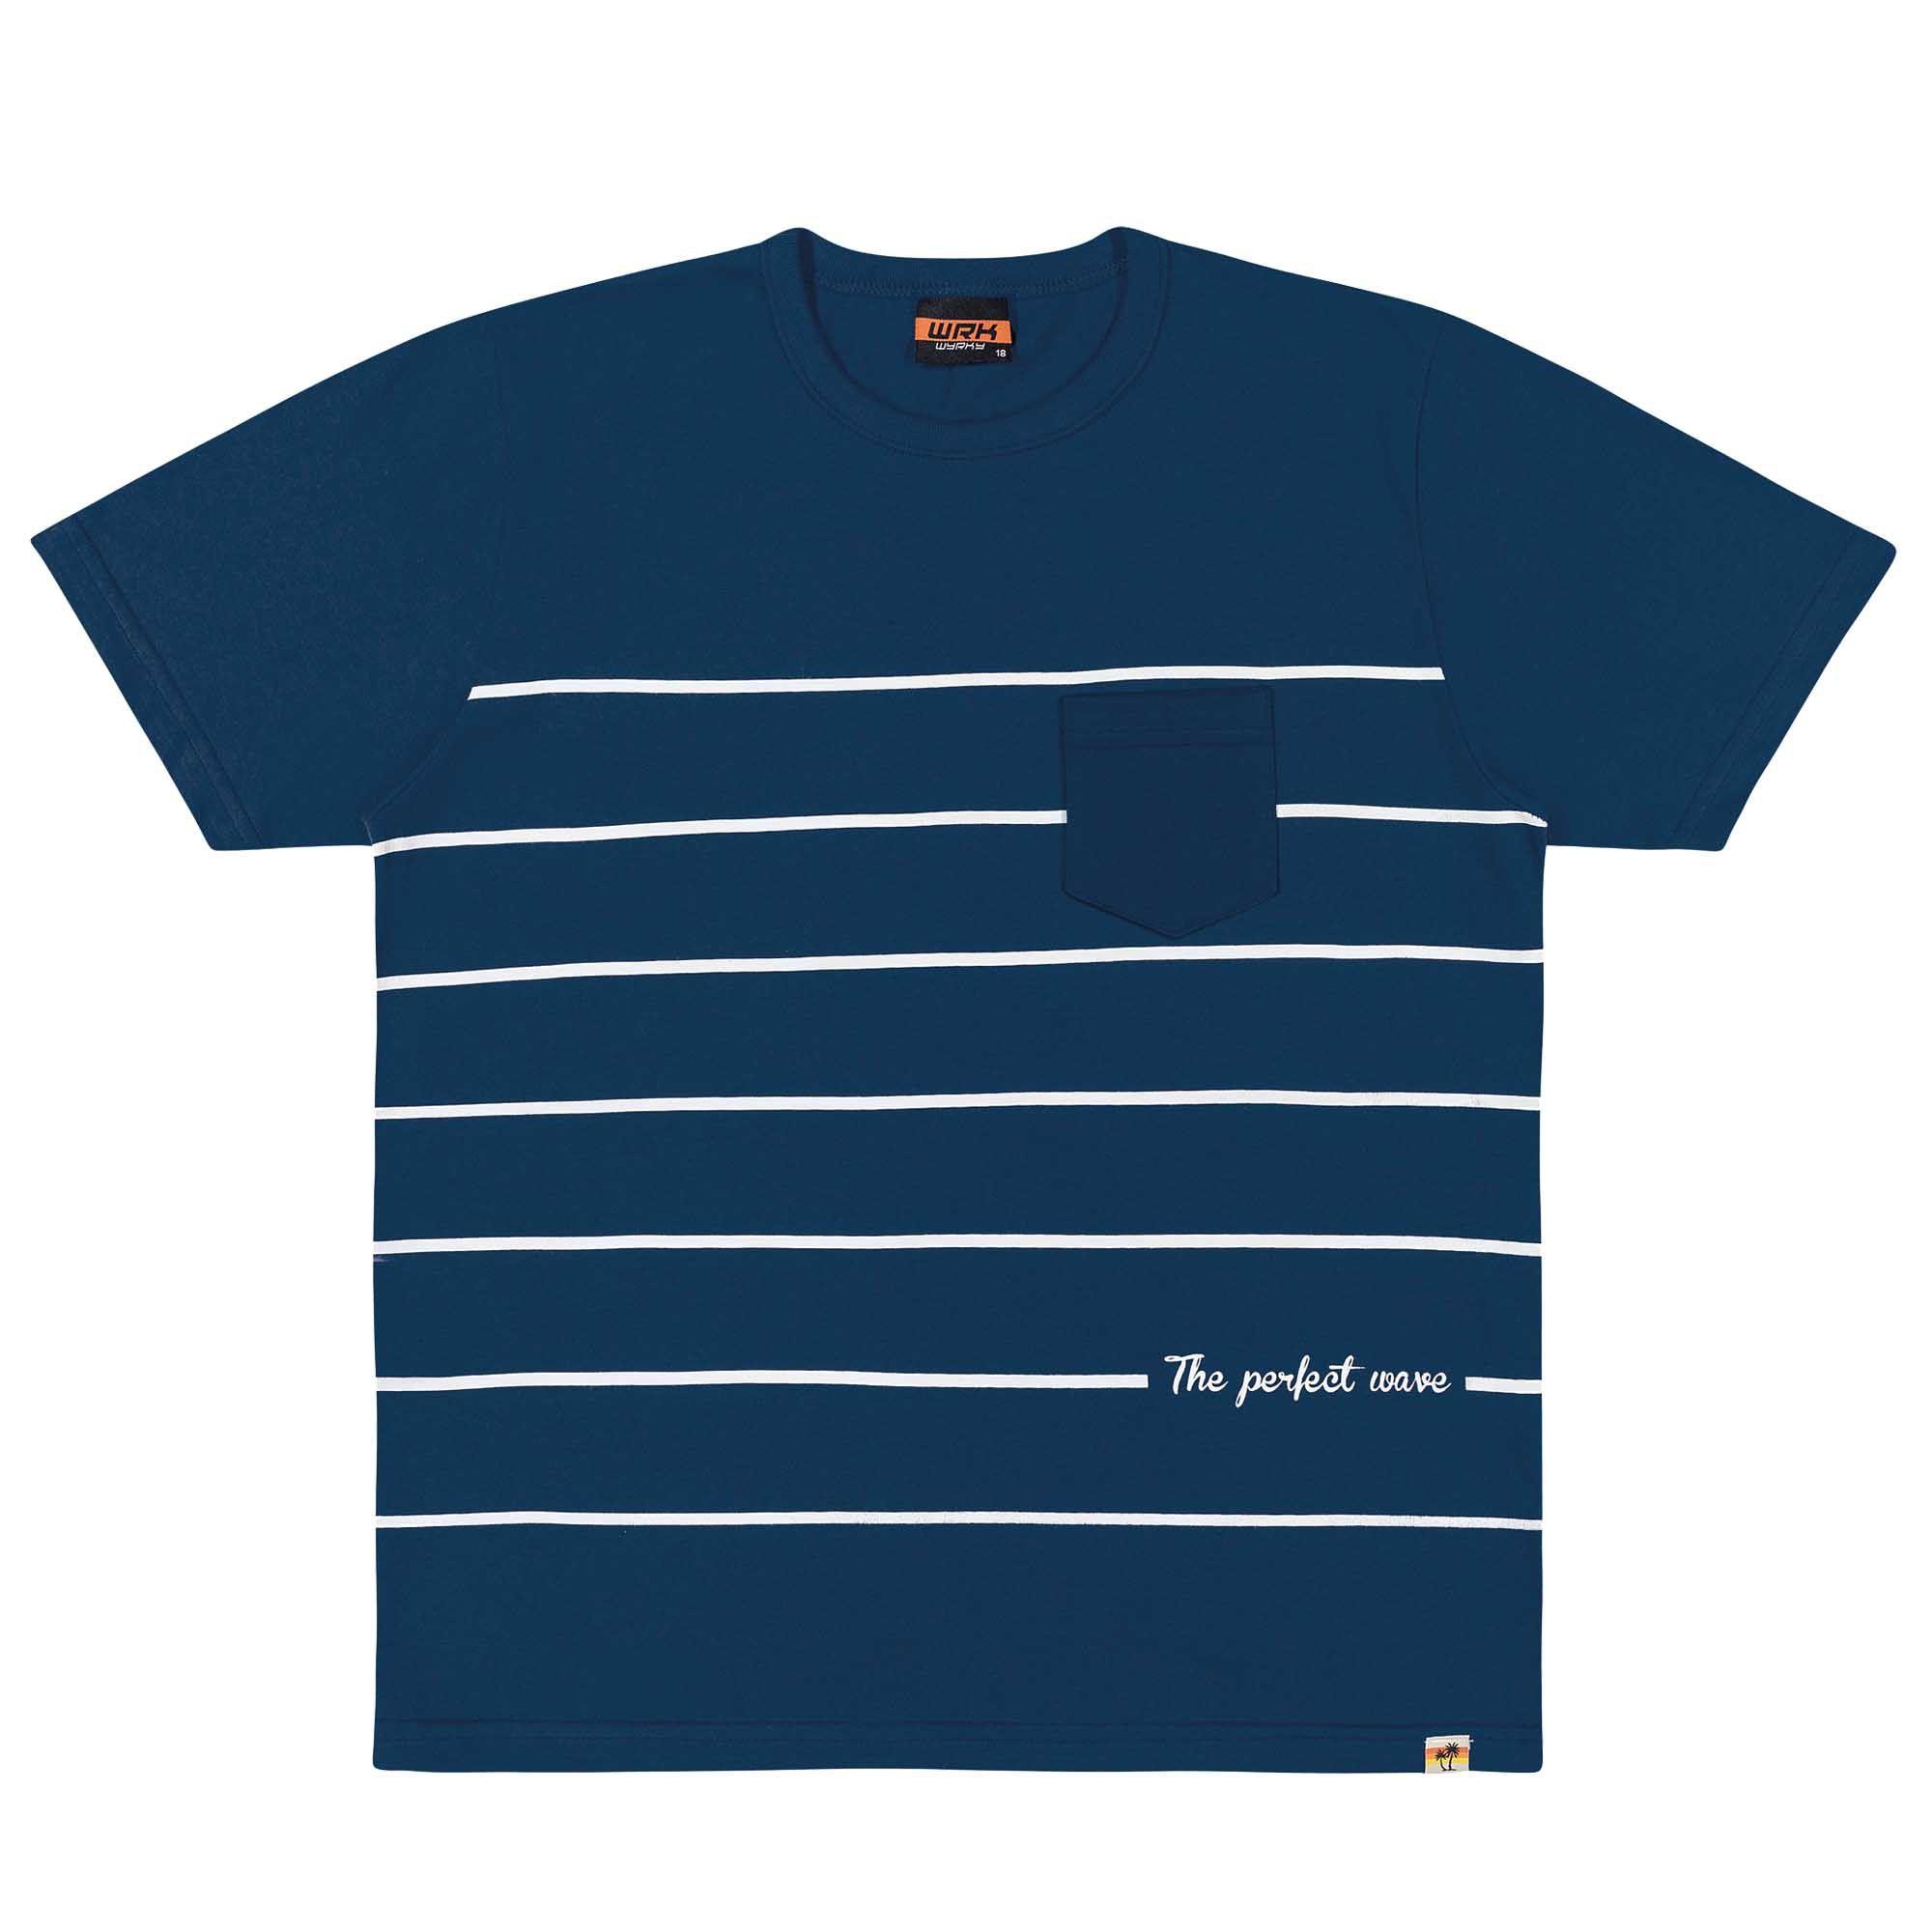 Camiseta Meia Manga Romitex Wyrky Listrada - 12 ao 18